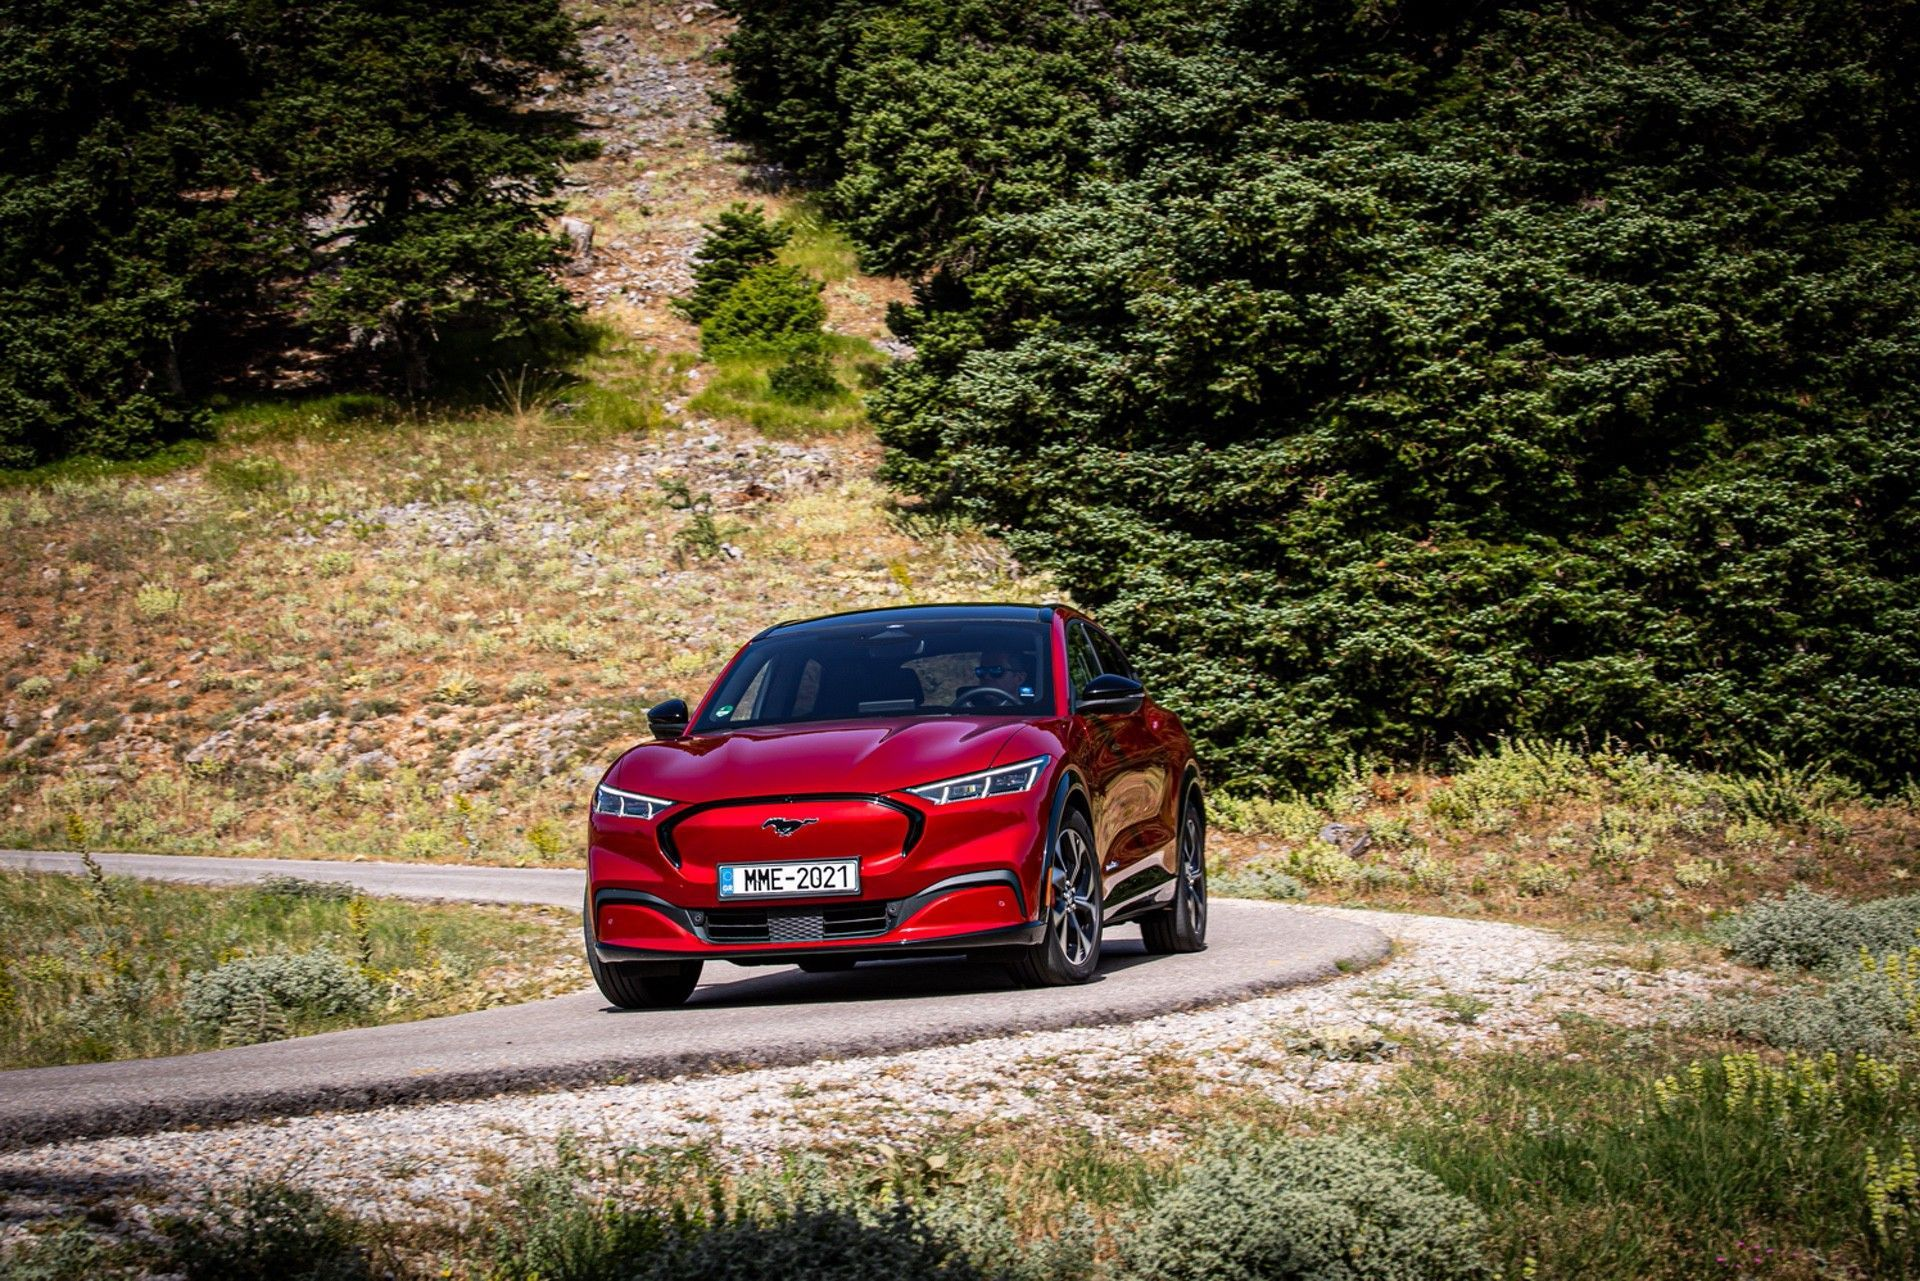 Ford_Mustang_Mach-E_greek_presskit-0125